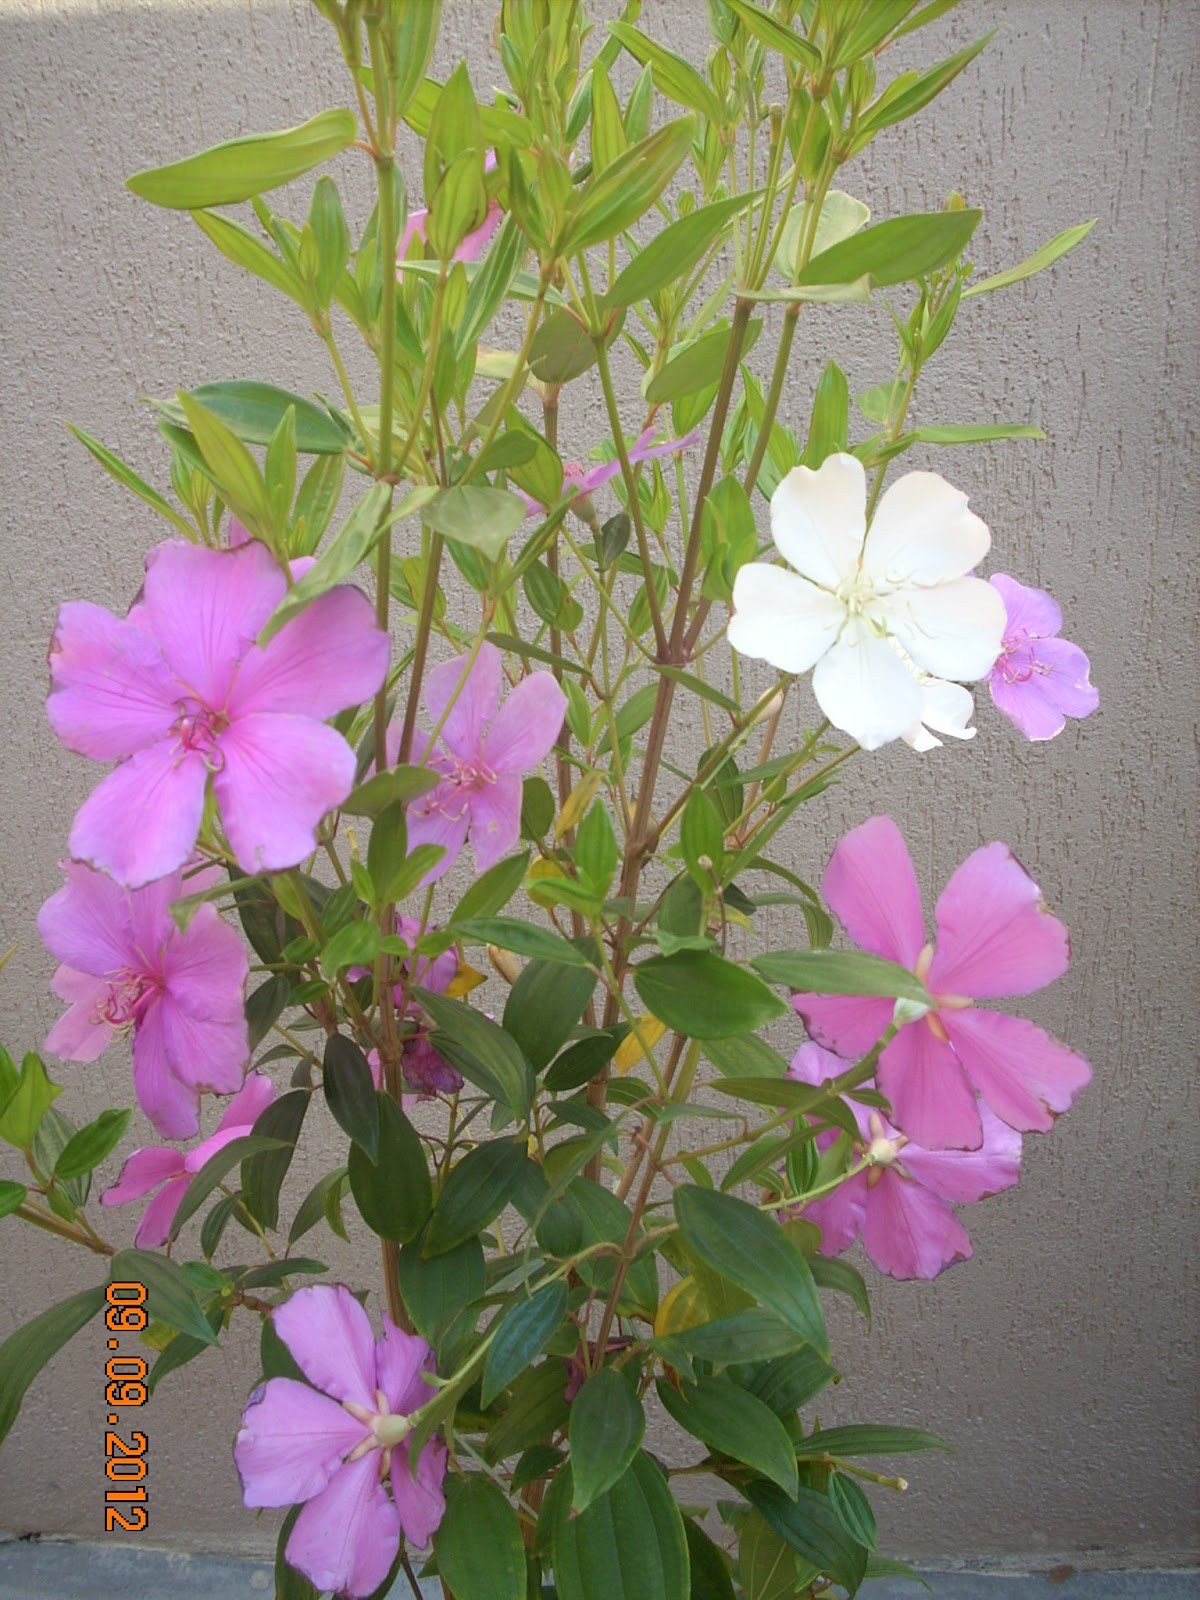 meu quintal meu jardim : meu quintal meu jardim: meu jardim # coisasdeada manacá da serra do meu jardim # coisasdeada